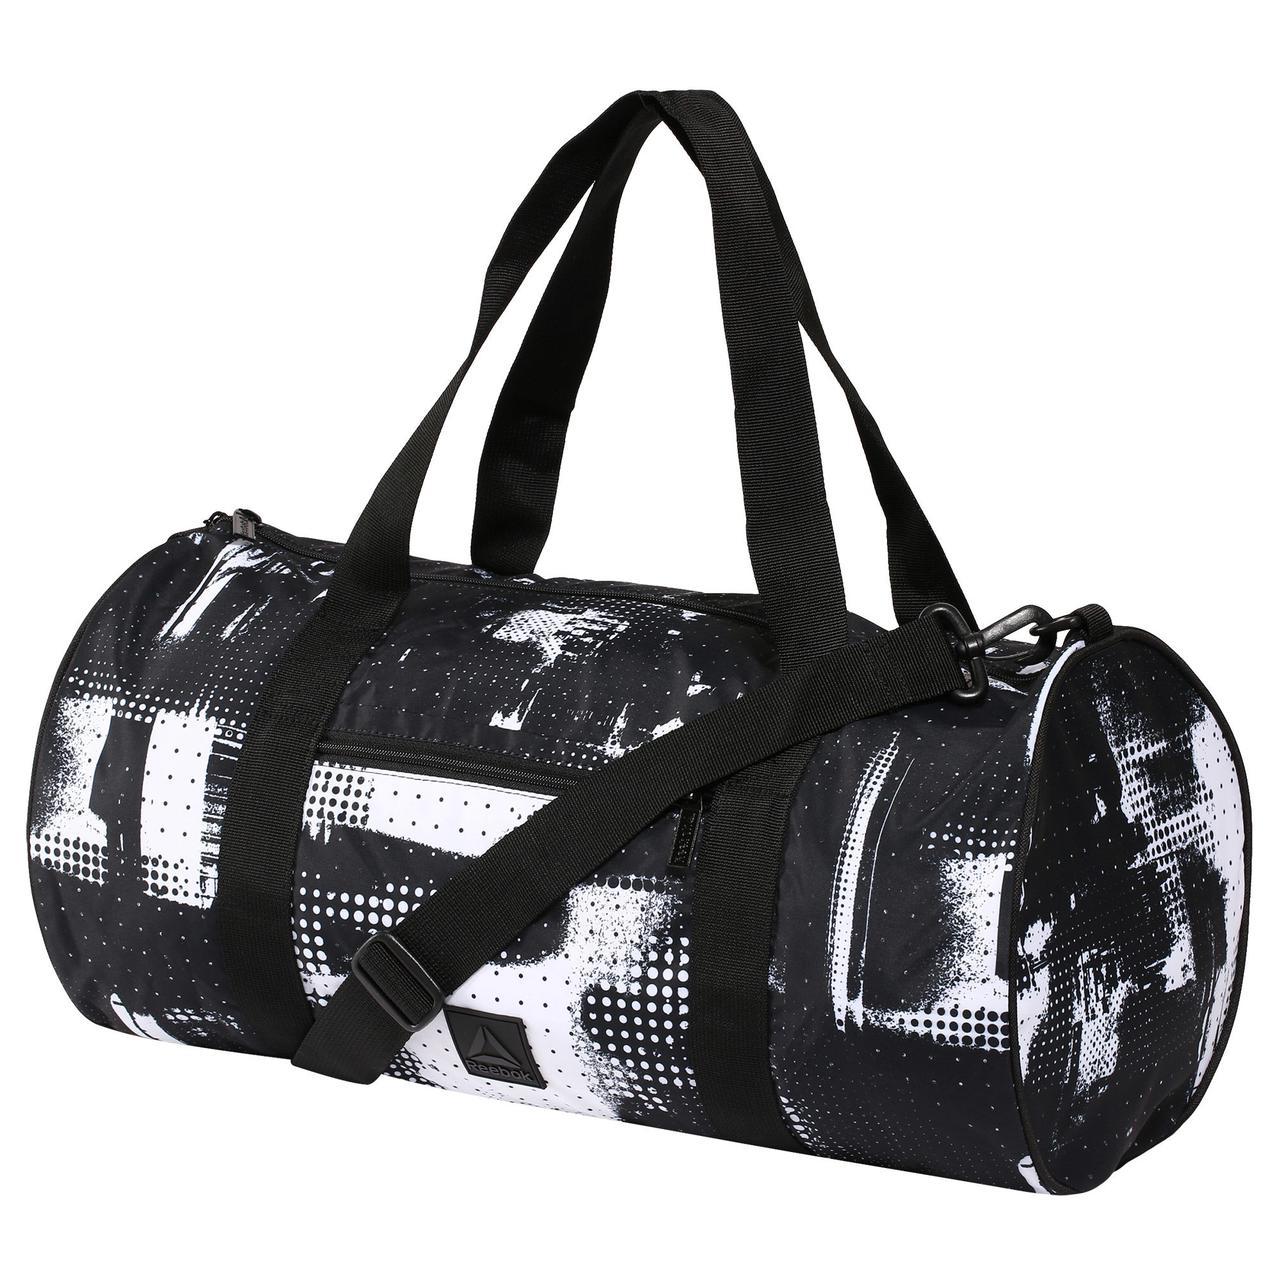 da0f65b5 Купить Женская сумка Reebok Style Found (Артикул: DL8709) в интернет ...